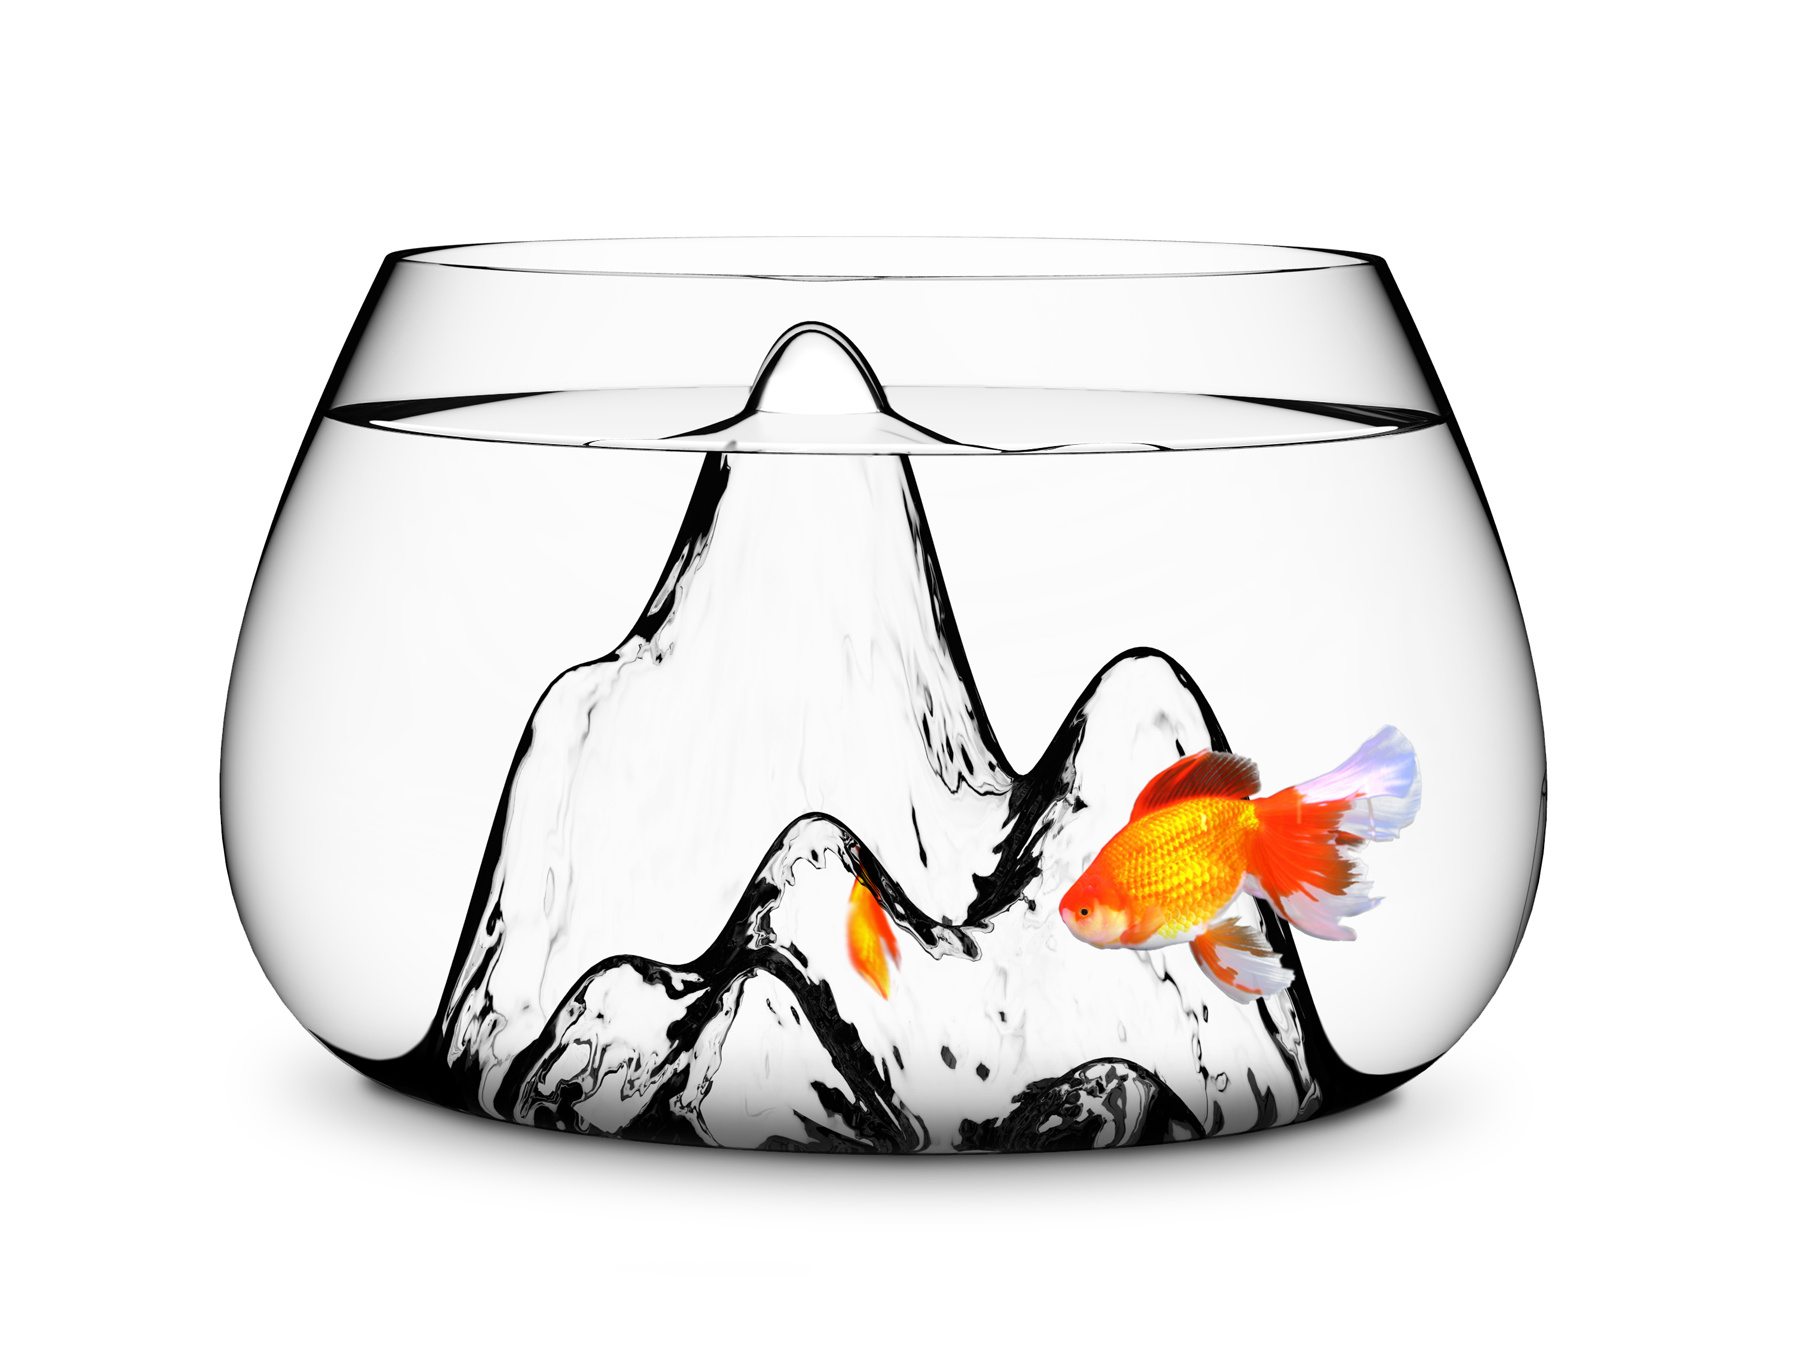 1800x1350 Aruliden Glasscape Underwater Landscape Fish Bowl Aruliden Ahalife